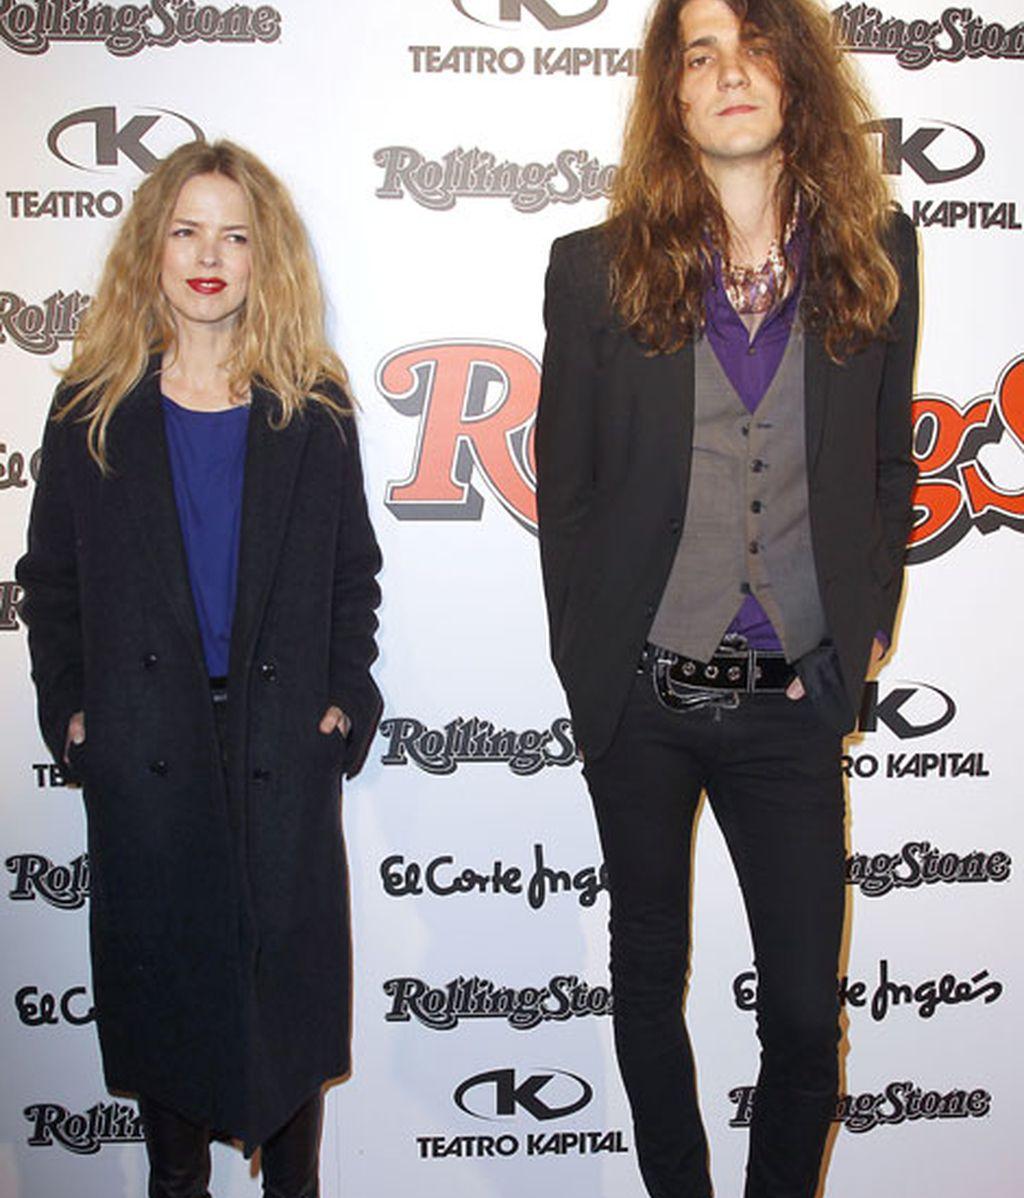 La cantante Cristina Rossenvigne eligió un abrigo 'oversize'